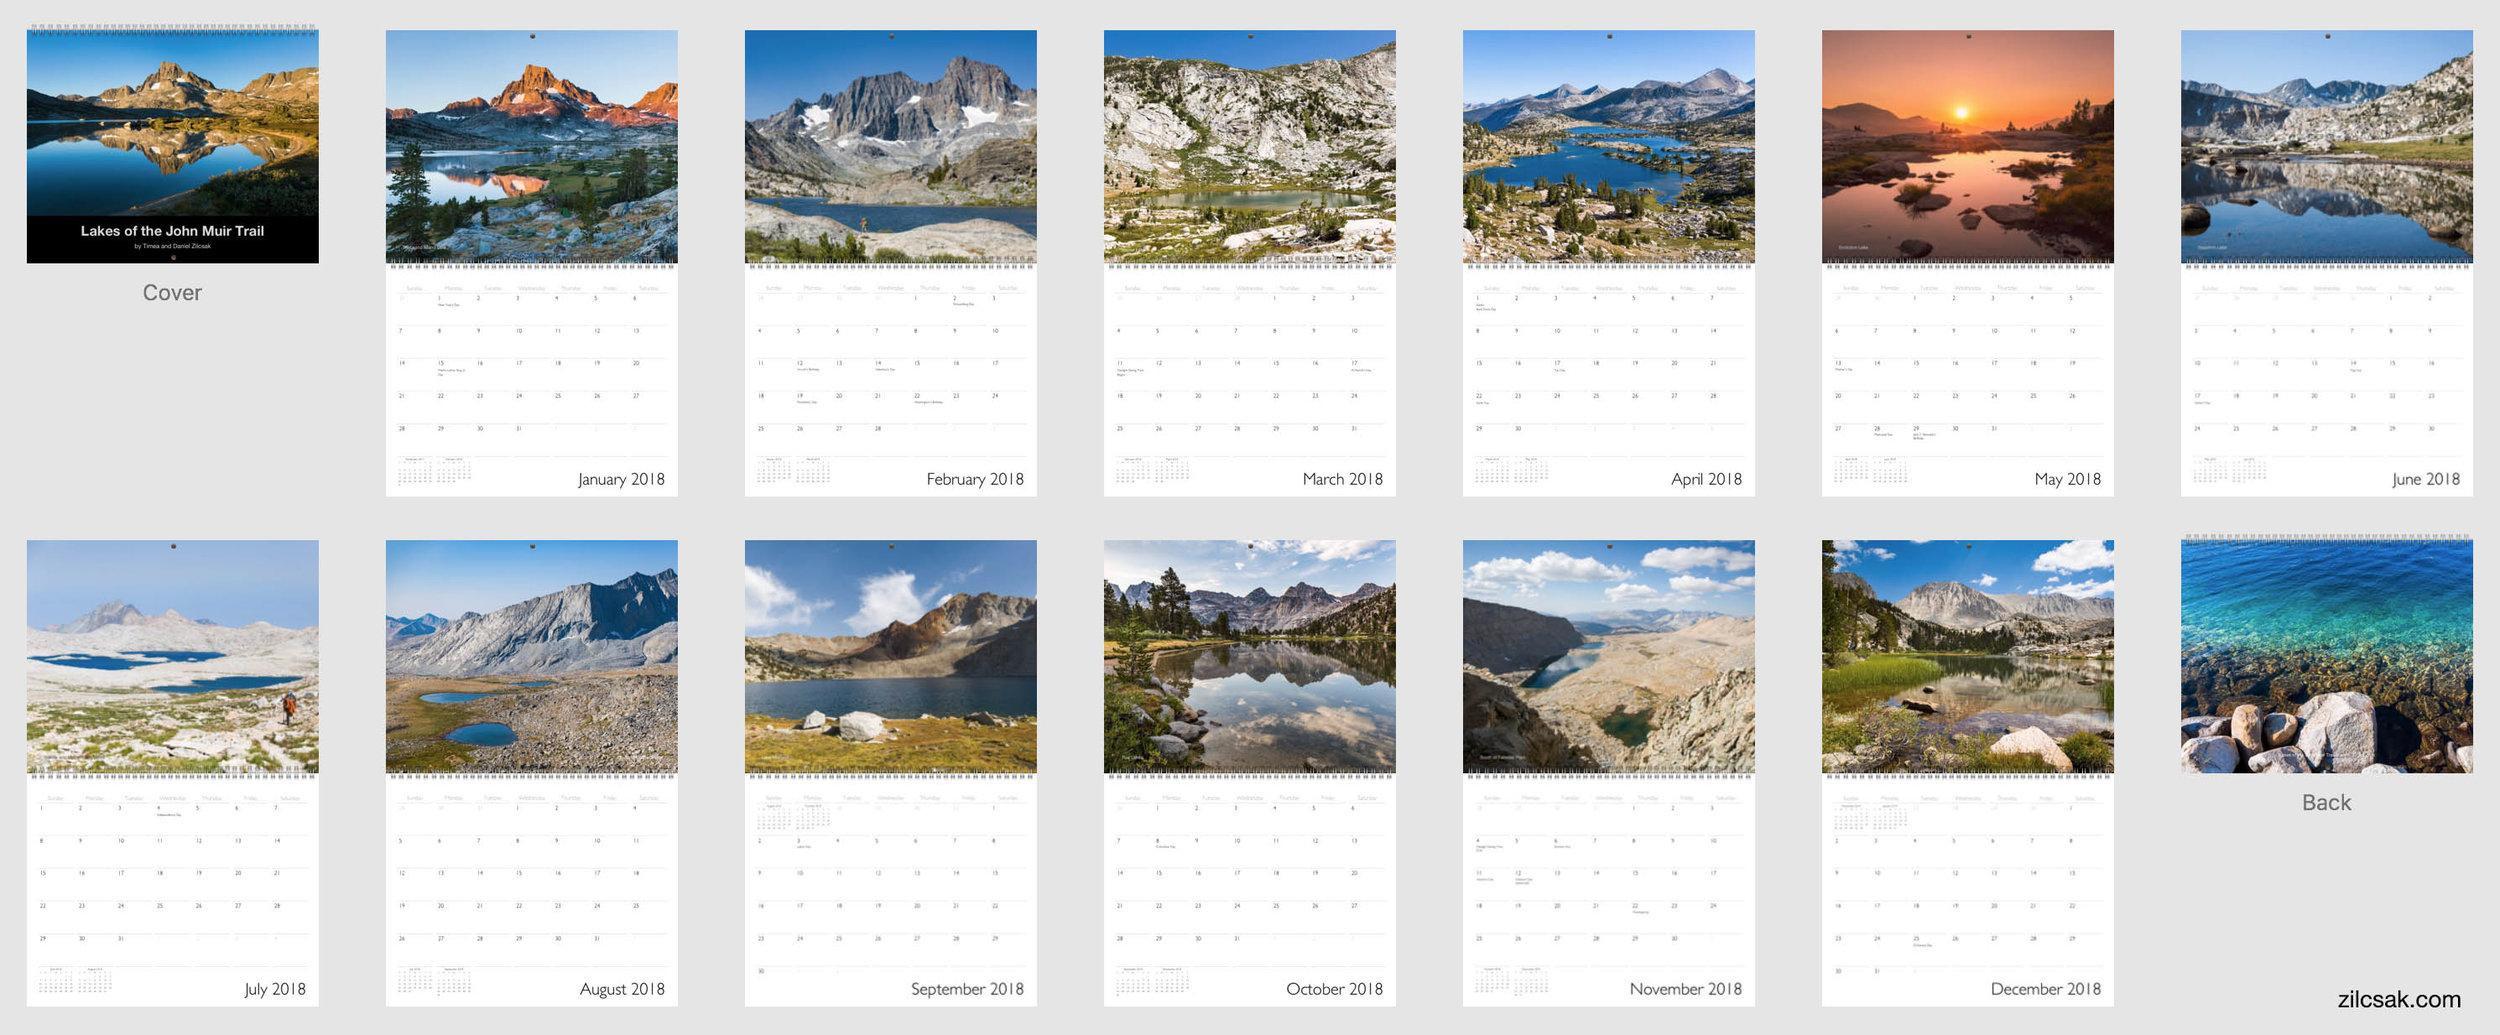 Lakes-of-the-John-Muir-Trail,2018-Calendar-Zilcsak.jpg